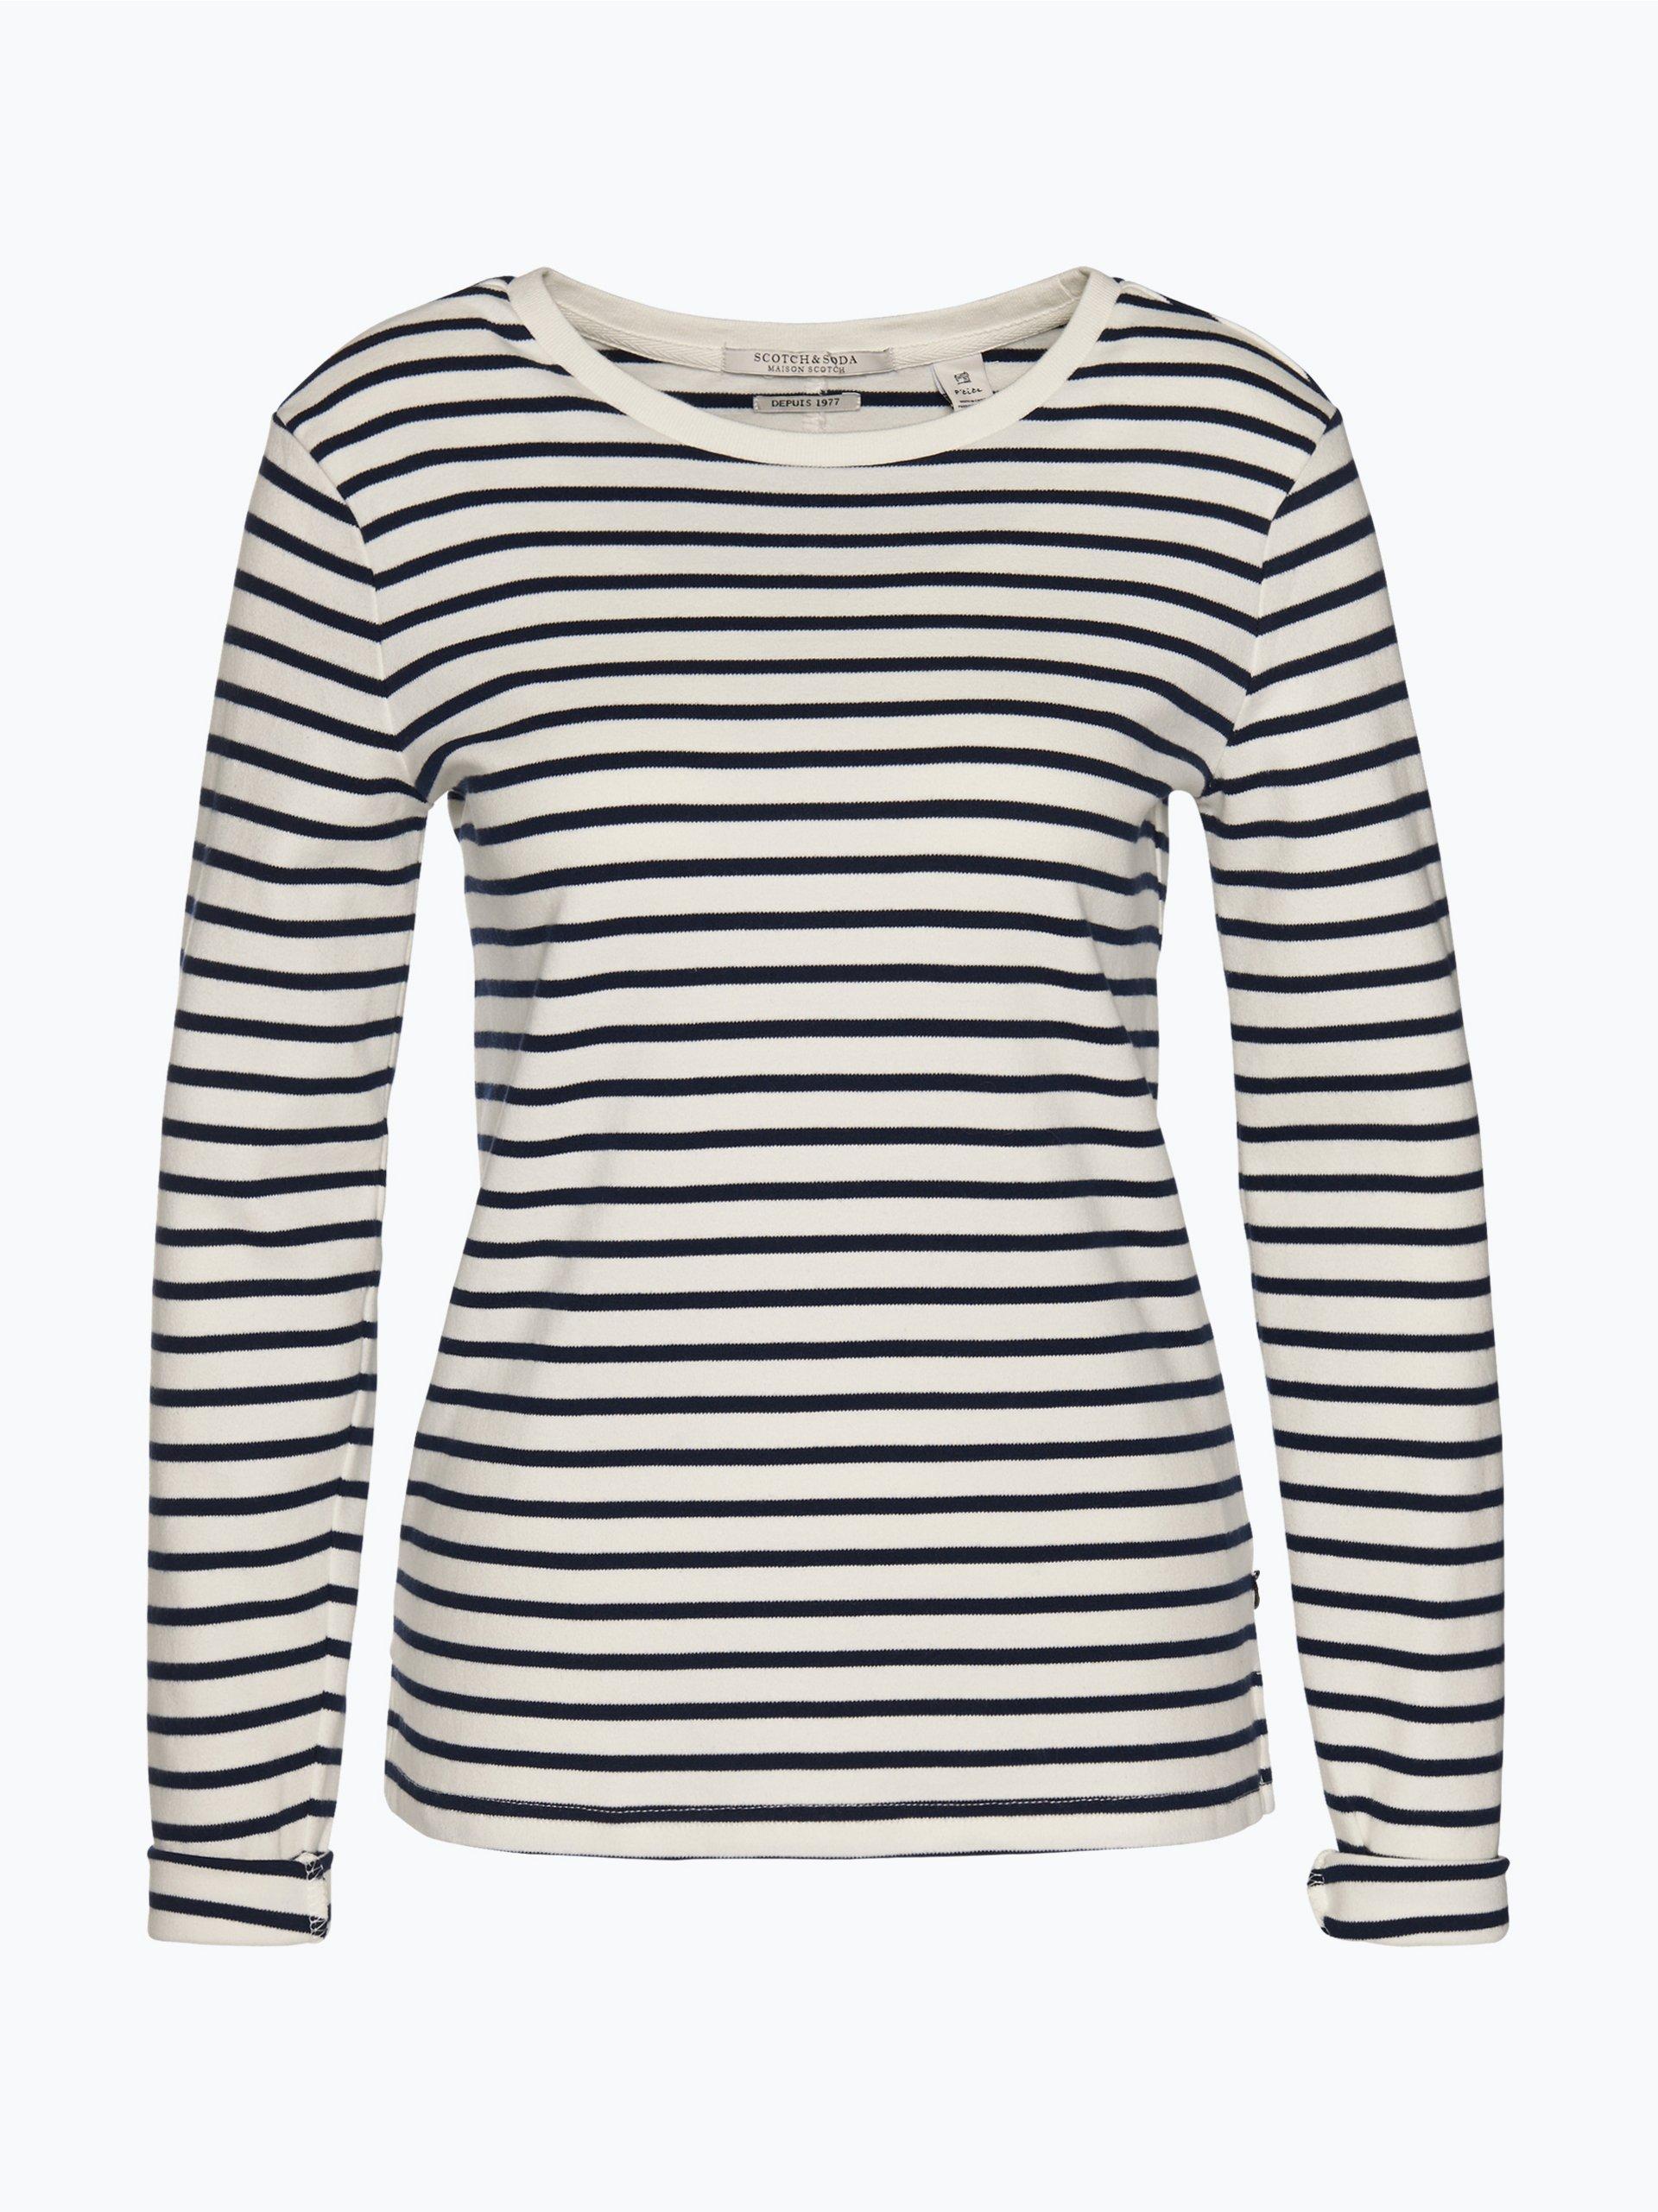 scotch soda damen sweatshirt wei uni online kaufen. Black Bedroom Furniture Sets. Home Design Ideas